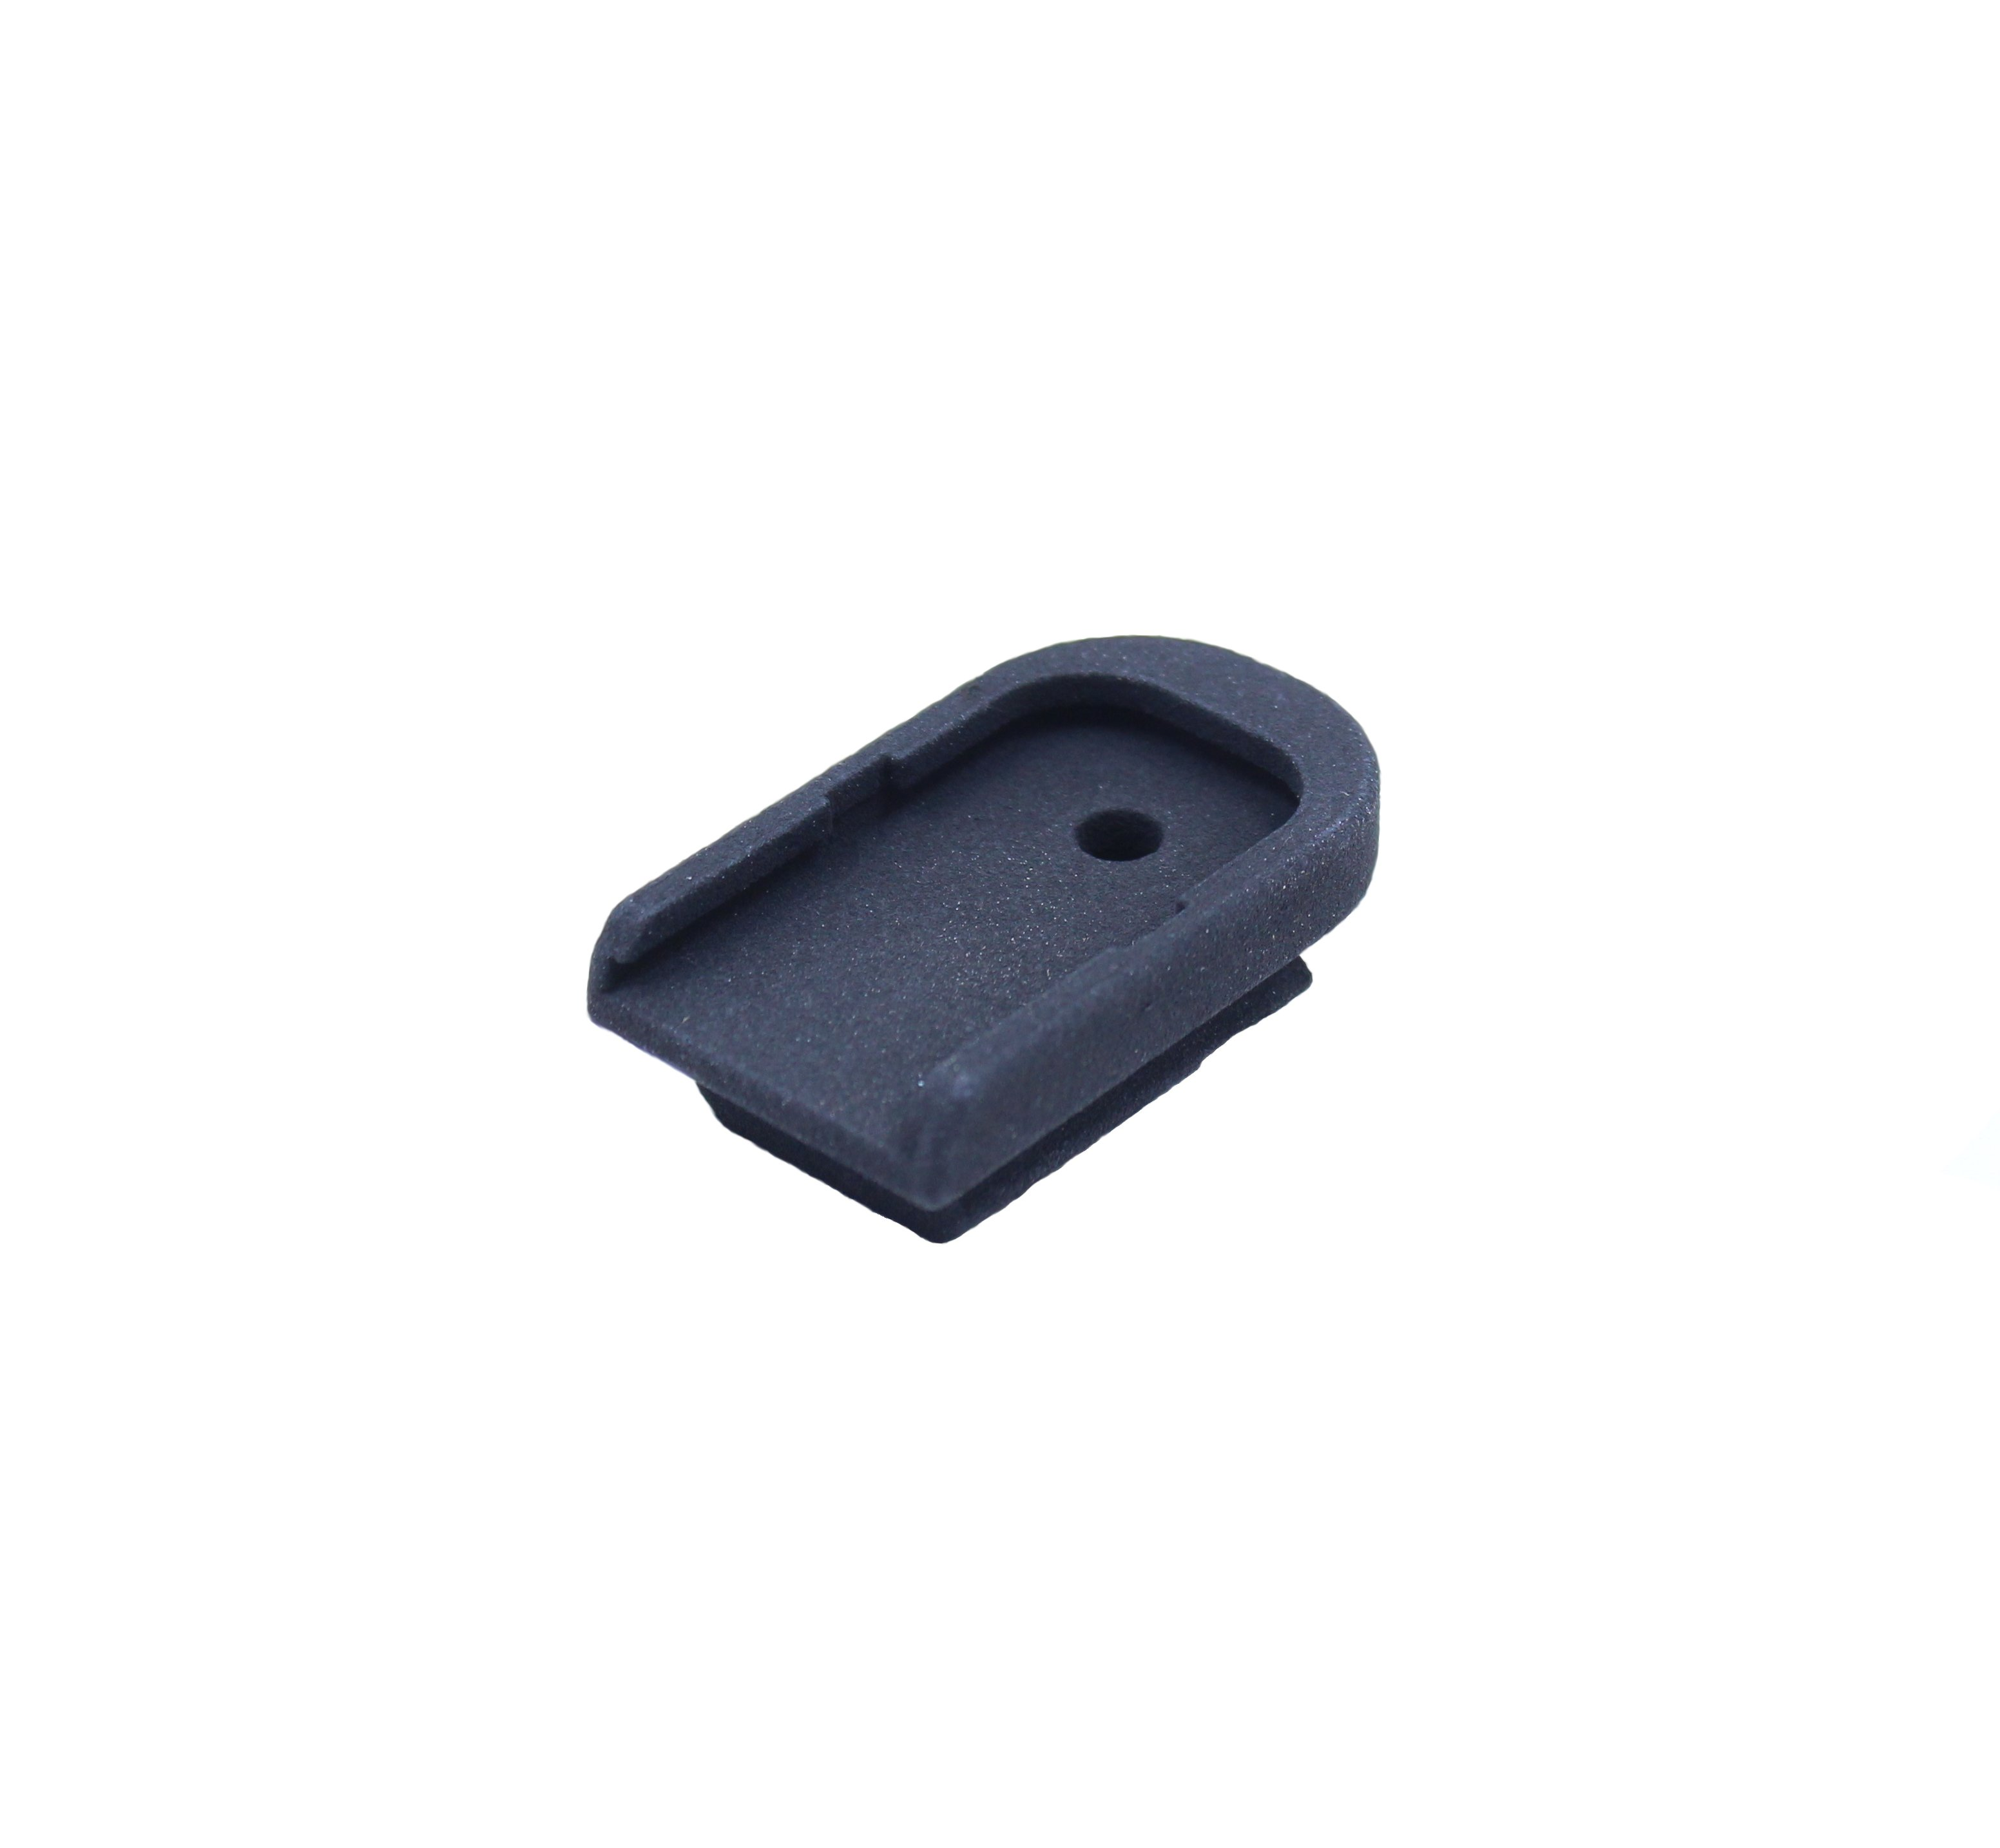 MAGRAIL - MAGAZIN BODENPLATTE Glock 48/43X